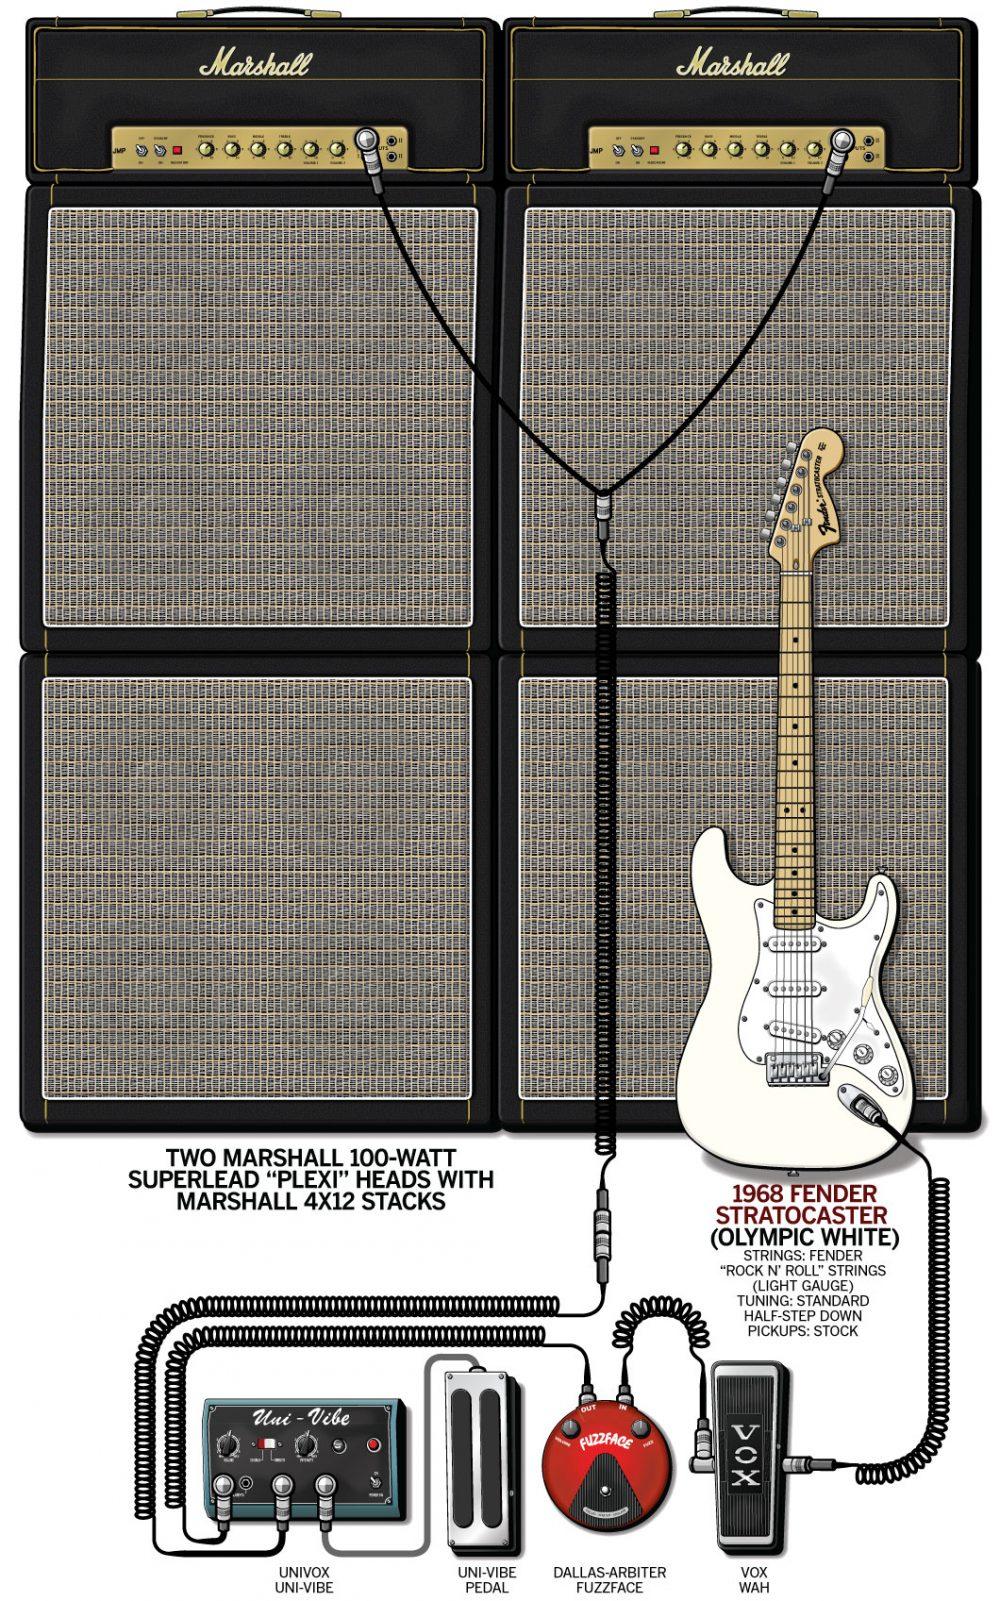 https://www.guitar4fans.com/wp-content/uploads/2015/02/b6c8b36c4d057664fe4738f547d33e52-e1553584383585.jpg